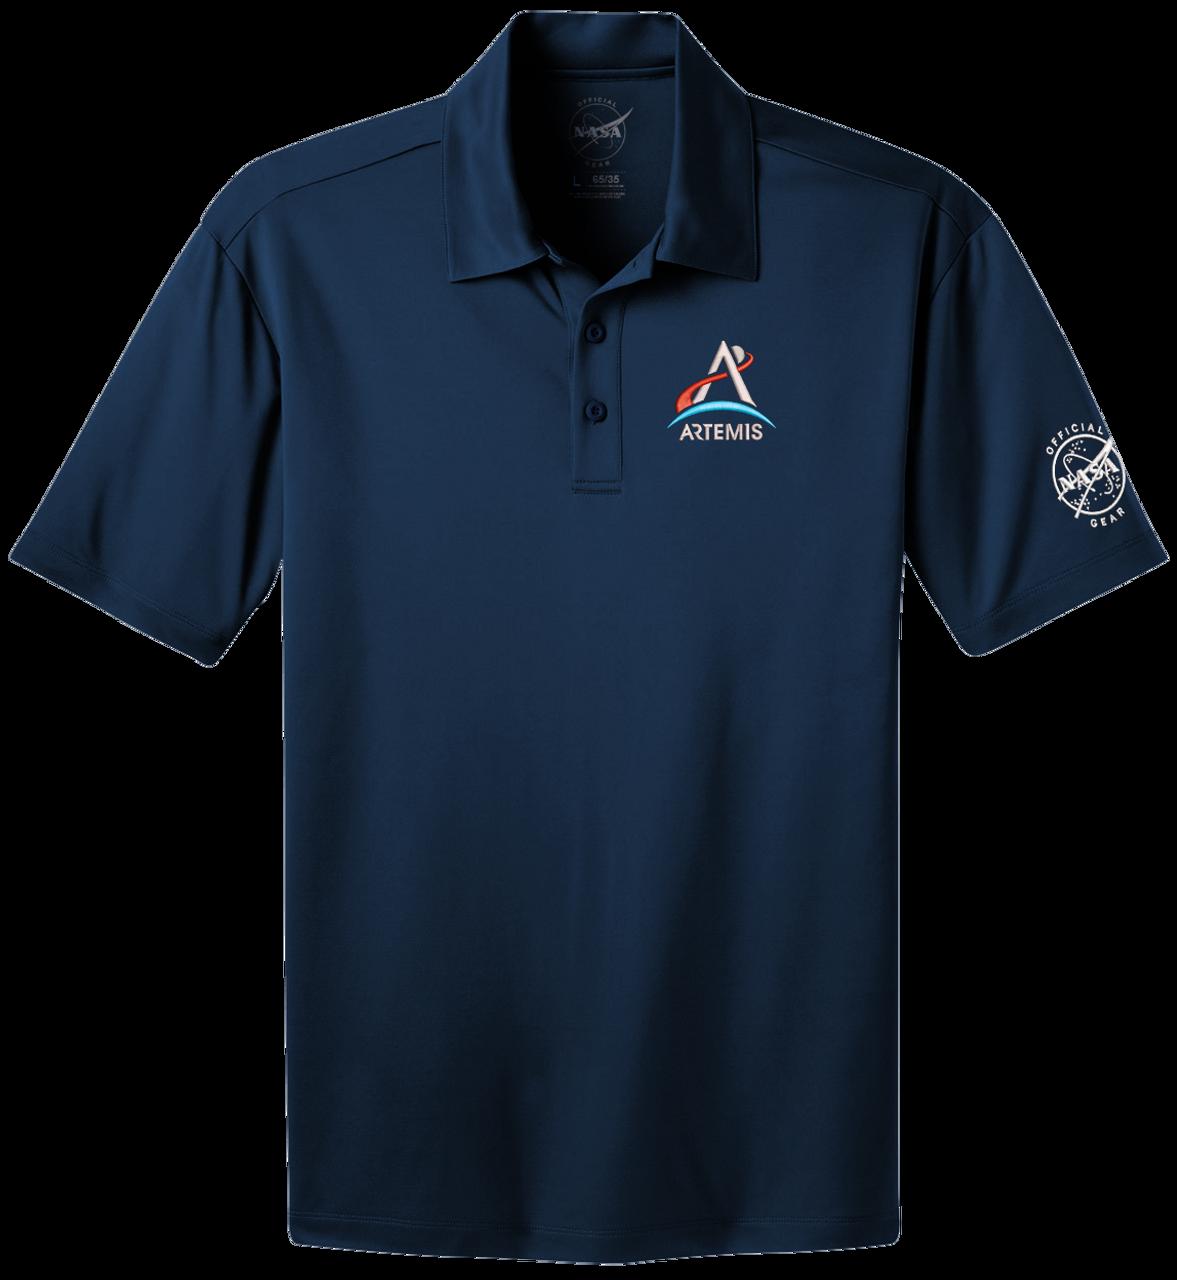 NASA Artemis Logo - Men's Polo Shirt *CLEARANCE*